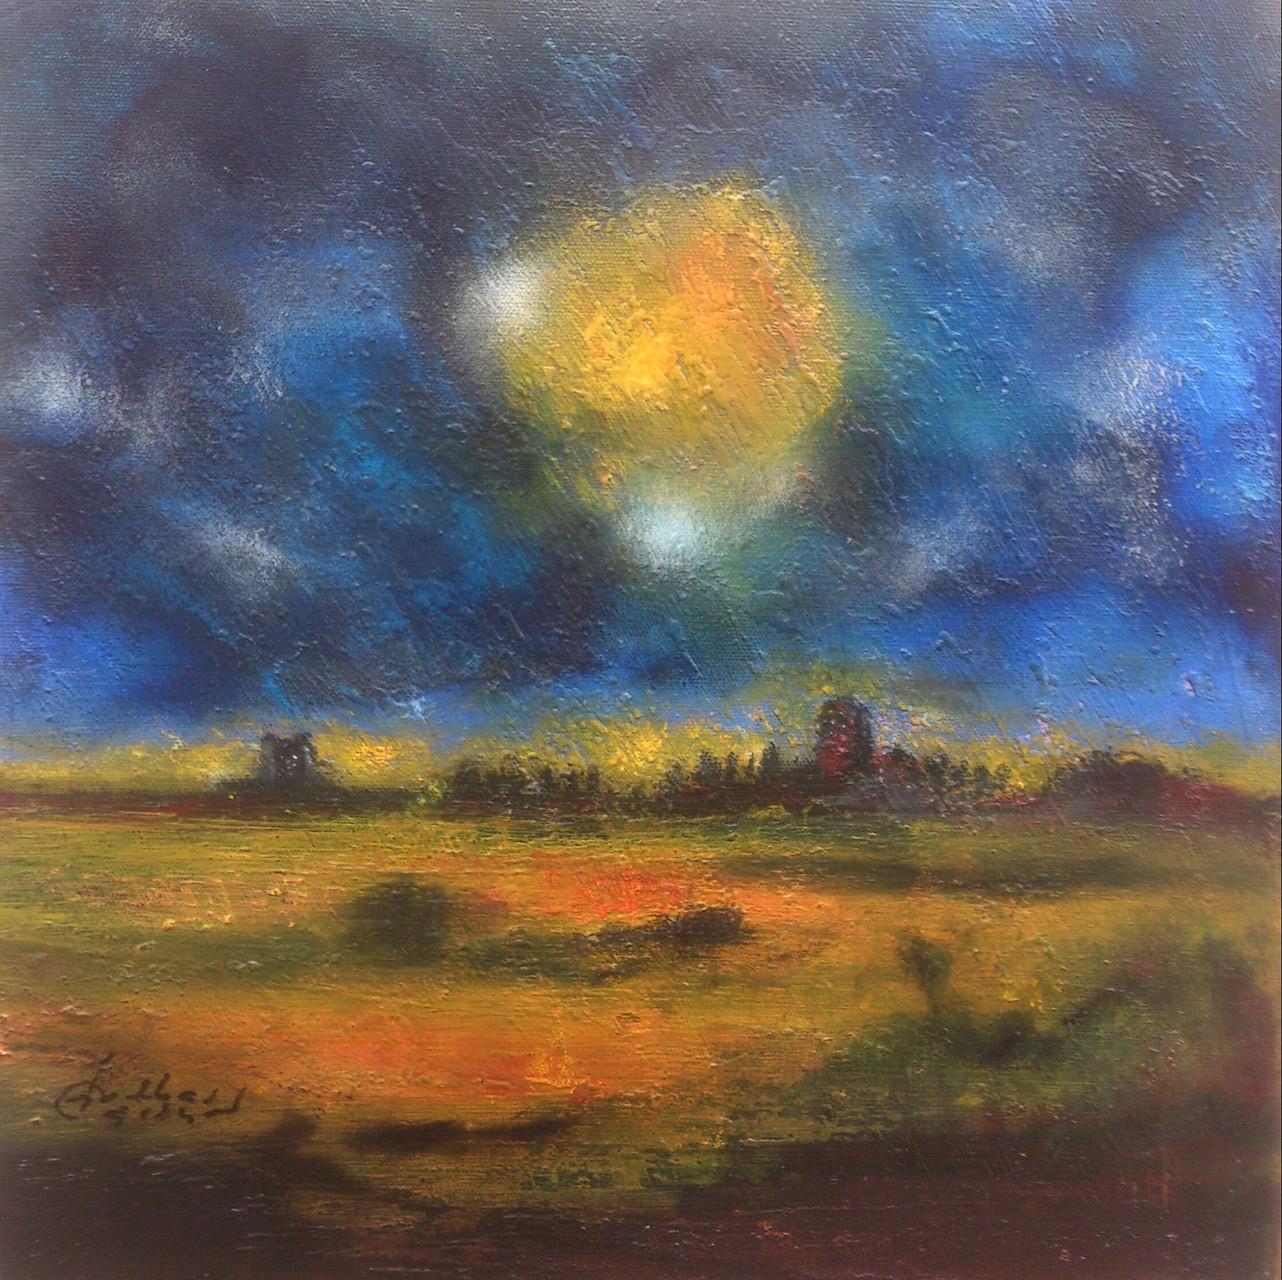 """Landschaft IV"" Acryl/Pigment auf Leinwand 40x40x8cm"